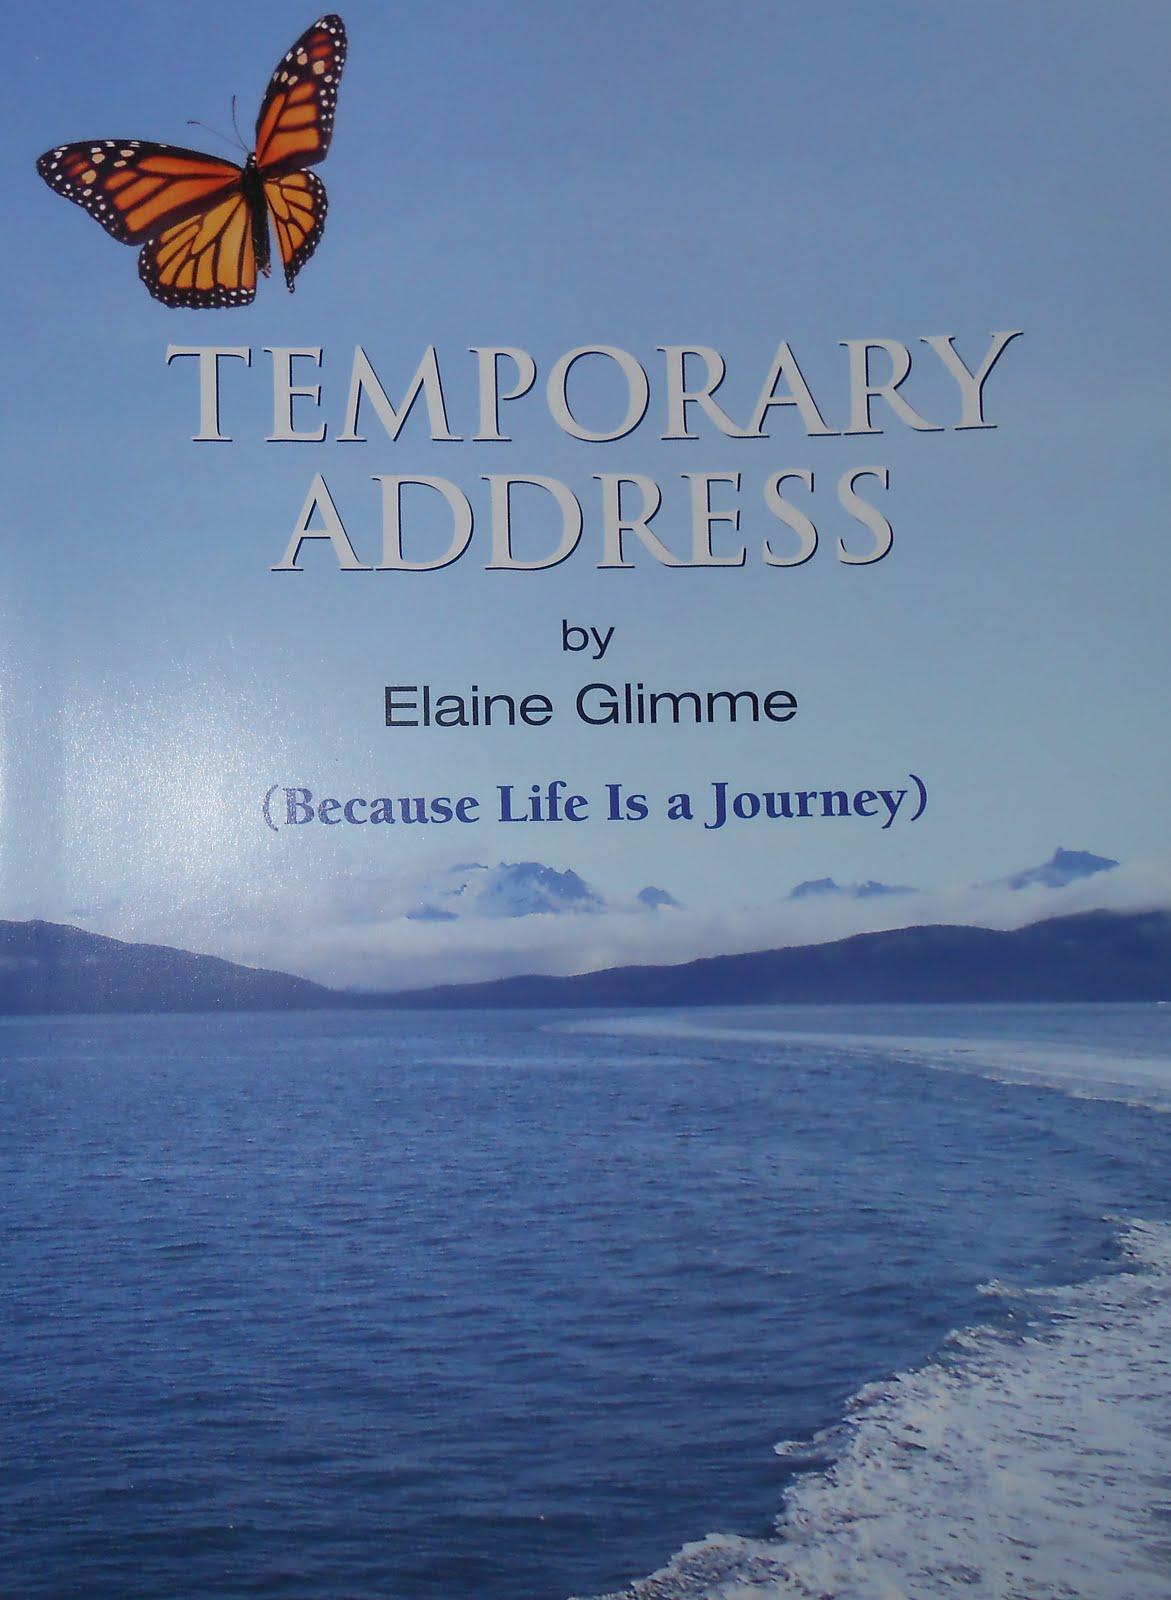 Temporary Address